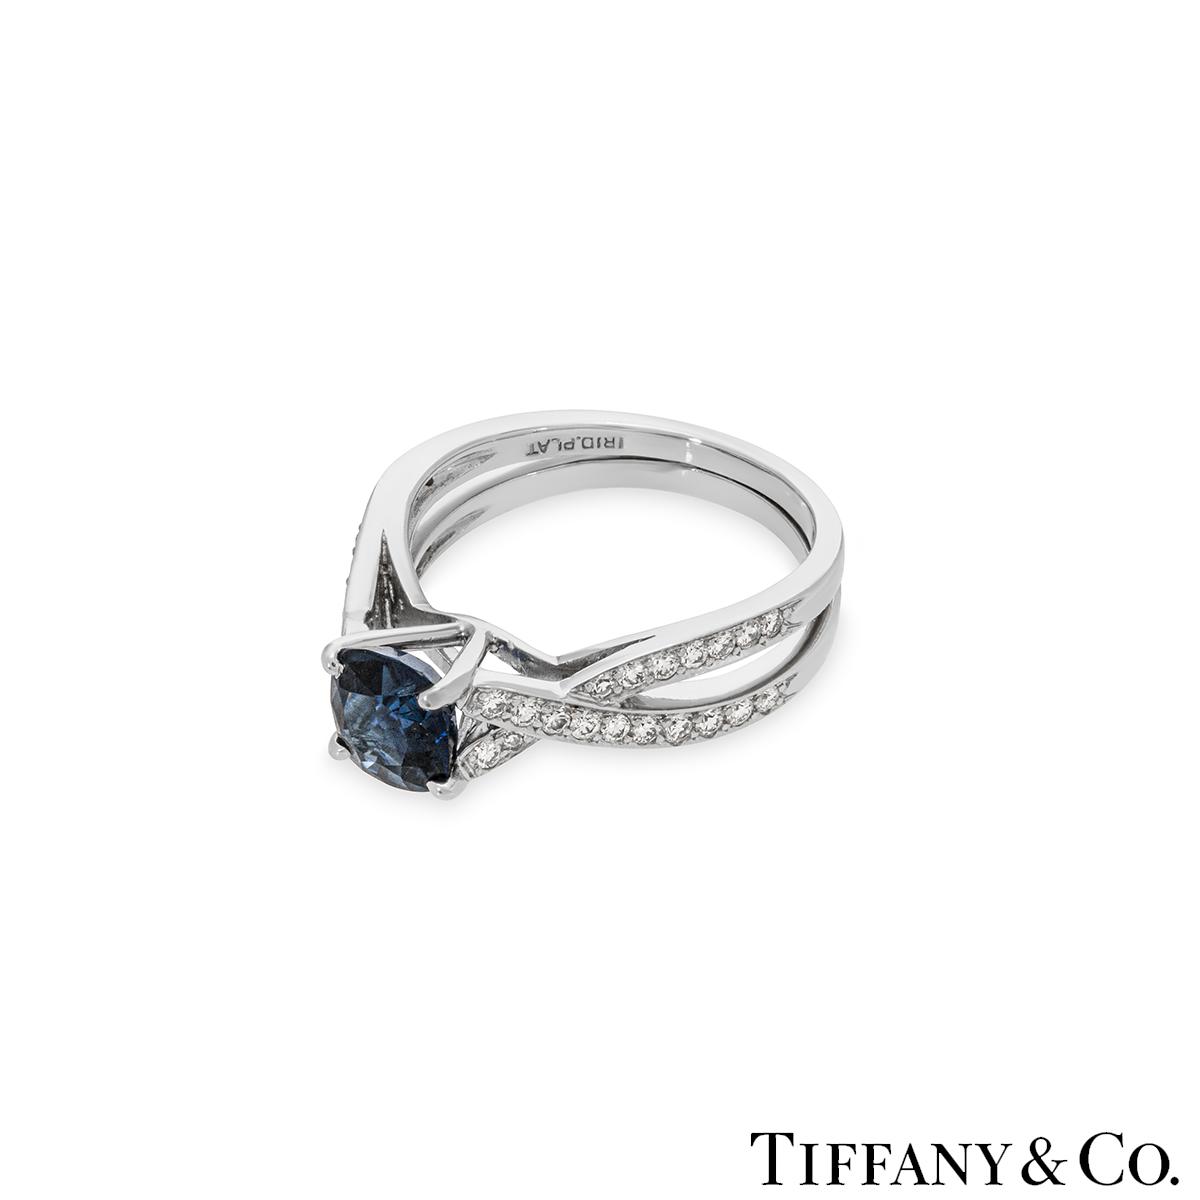 Tiffany & Co. Platinum Sapphire and Diamond Ring